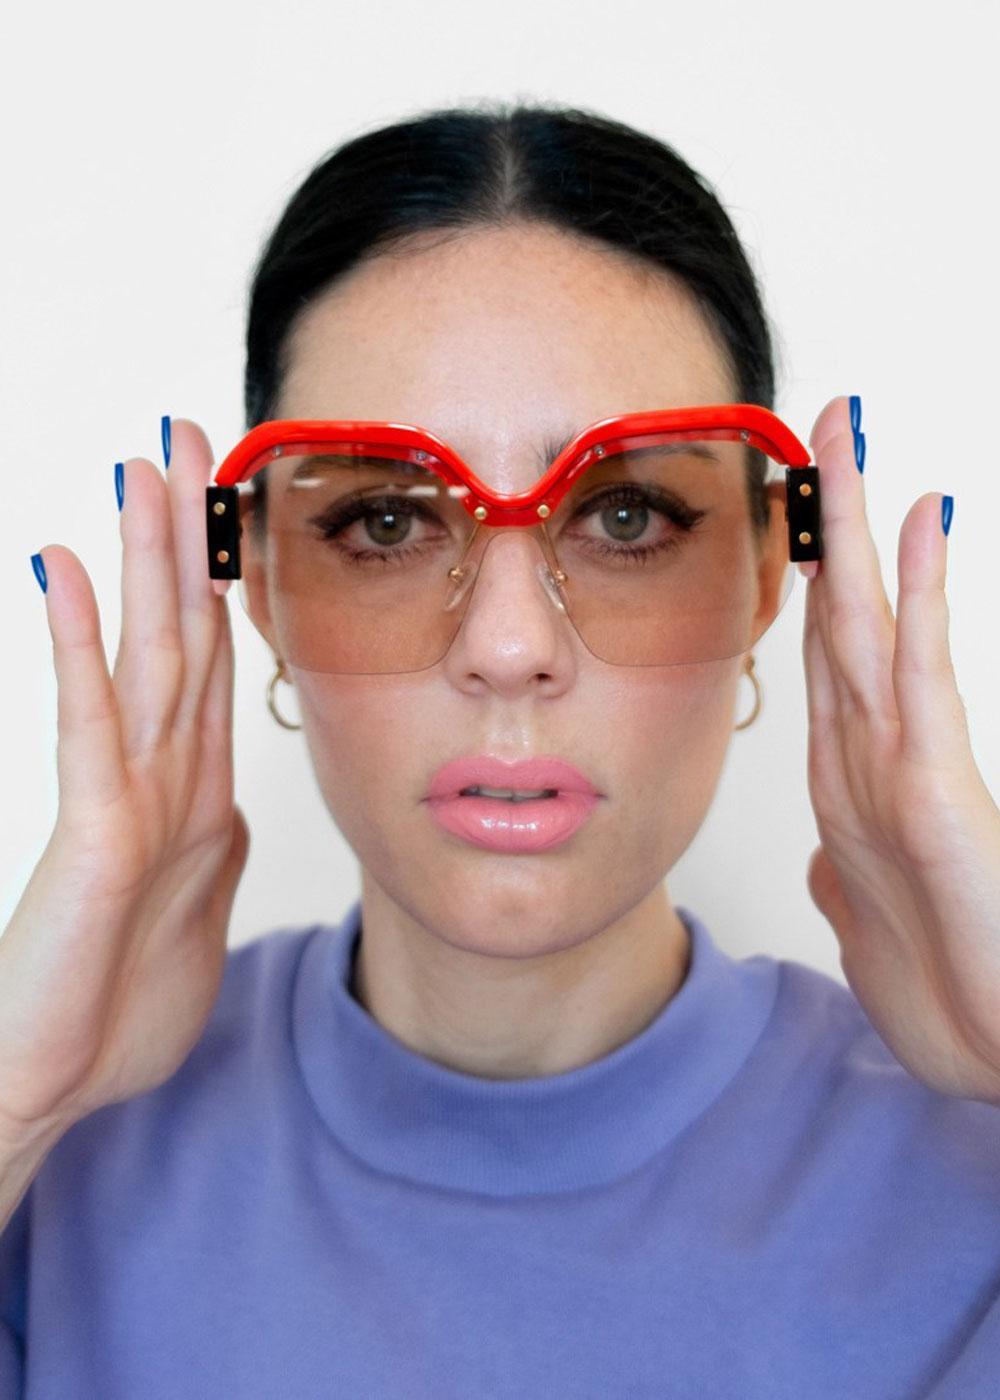 LCDglasses_pink2f.